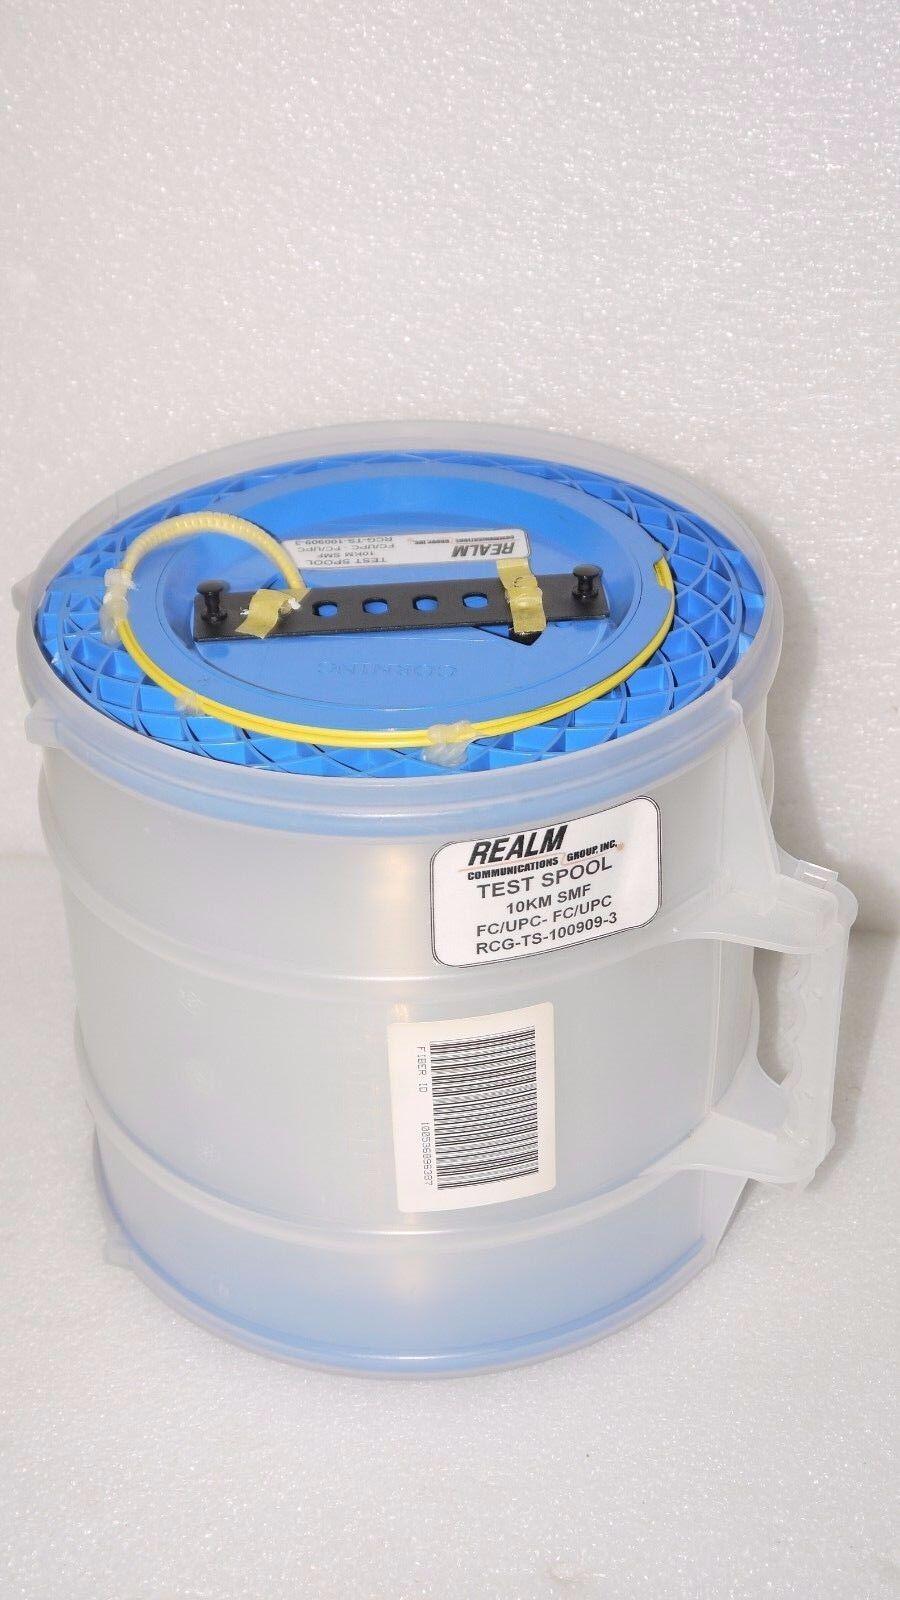 CORNING SMF SINGLE MODE OPTICAL FIBER CABLE WIRE SPOOL 10KM 10544 ...